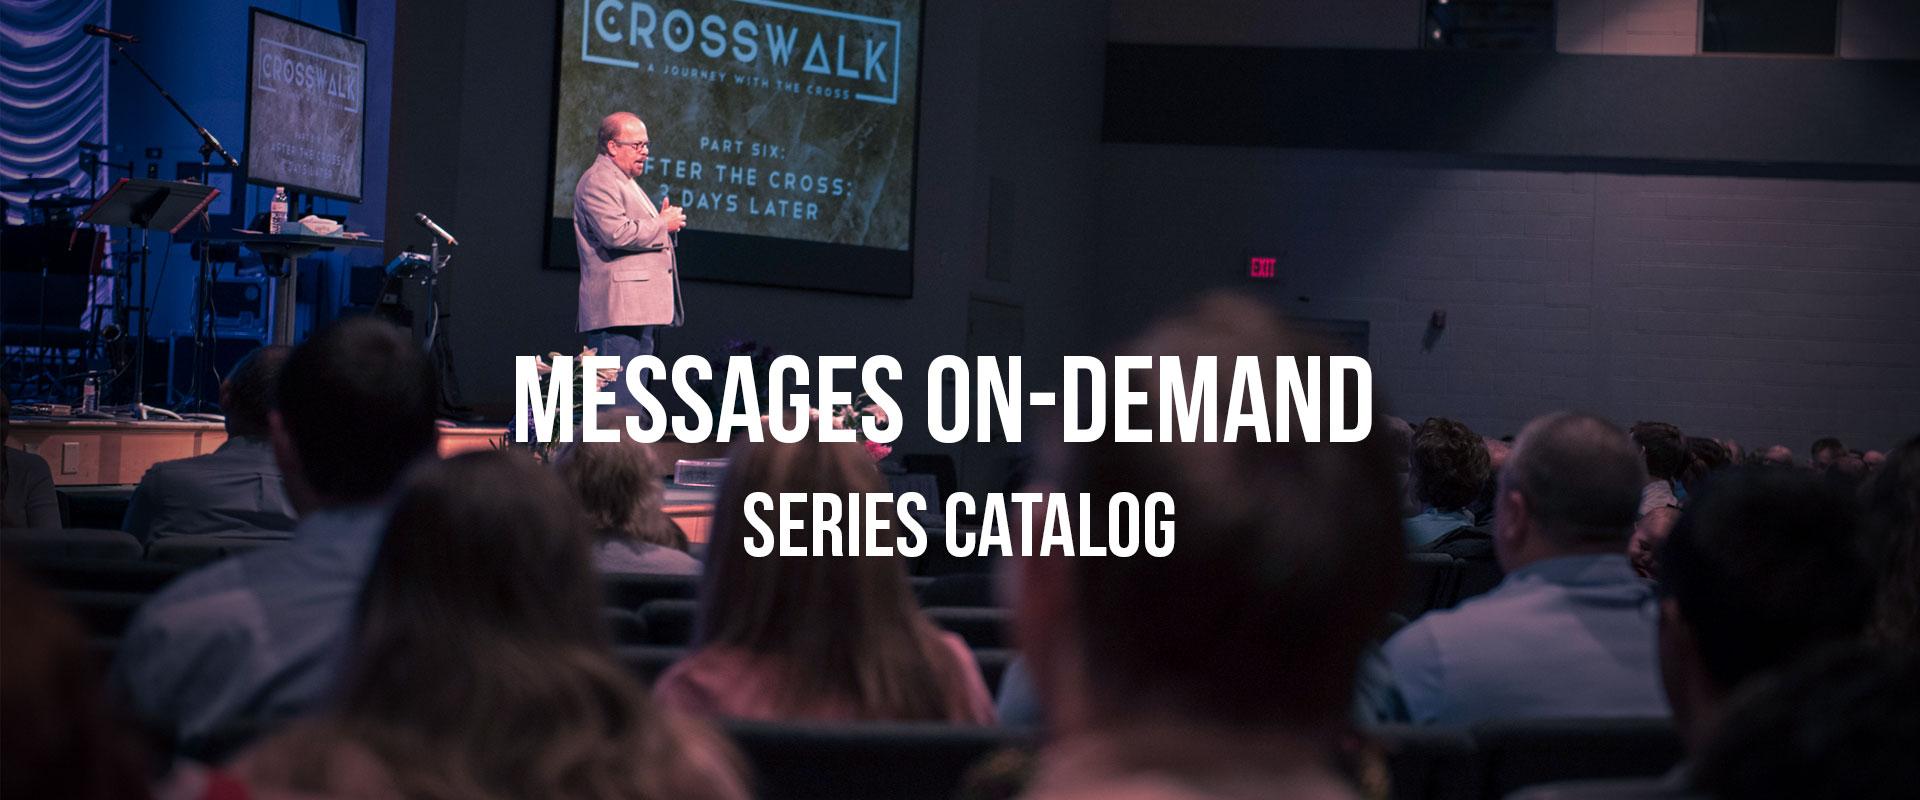 Messages-on-demand-New-Header